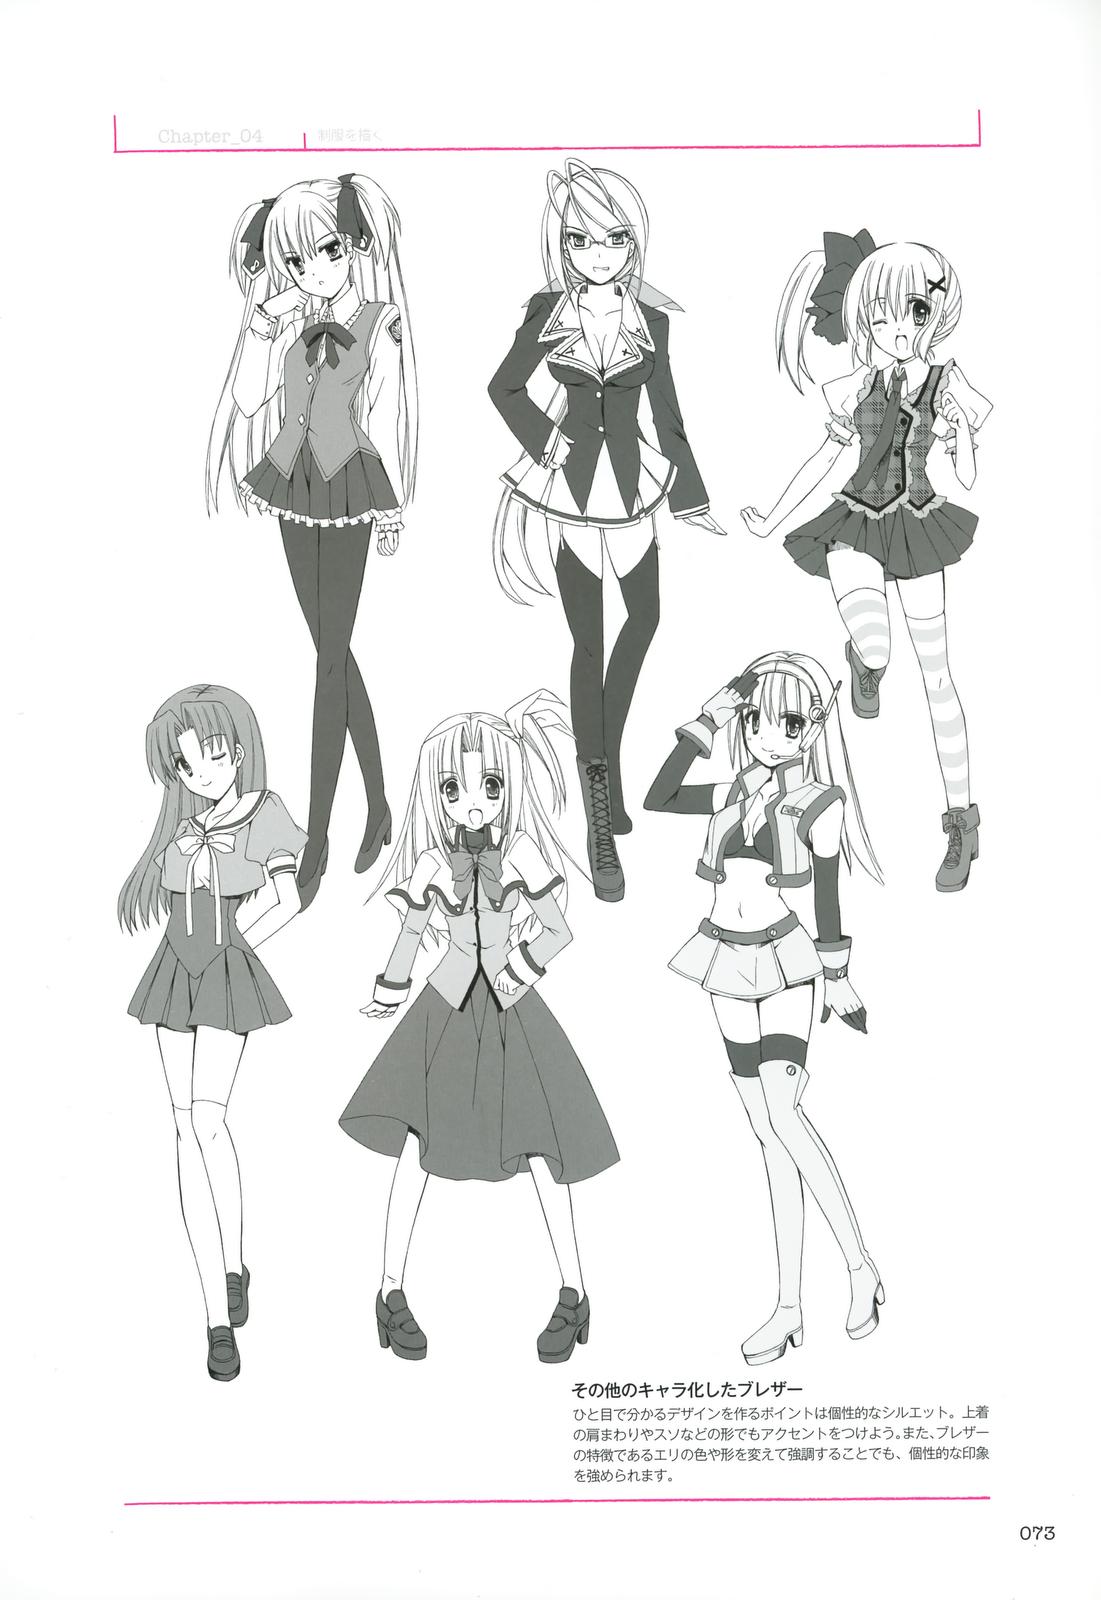 Kumpulan Soal Pelajaran 1 Desain Baju Anime Perempuan